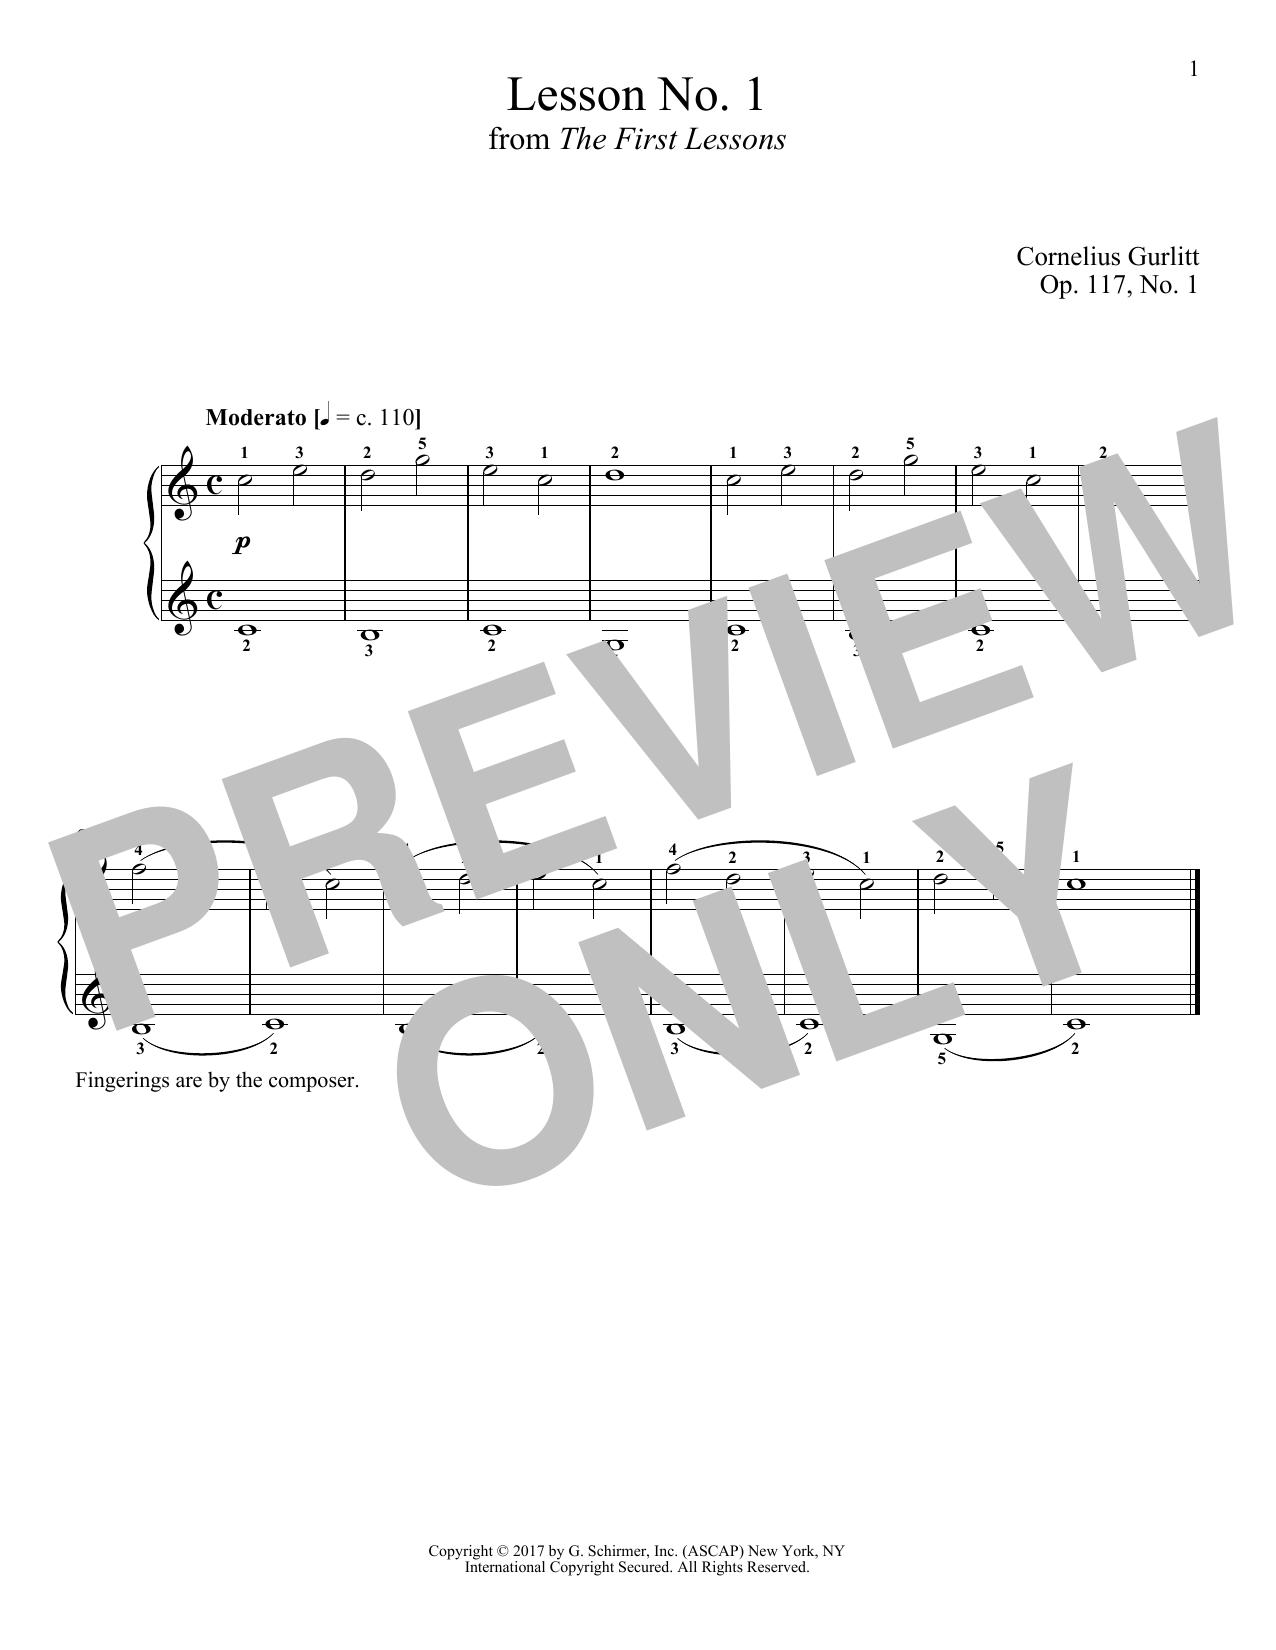 Moderato, Op. 117, No. 1 (Piano Solo)